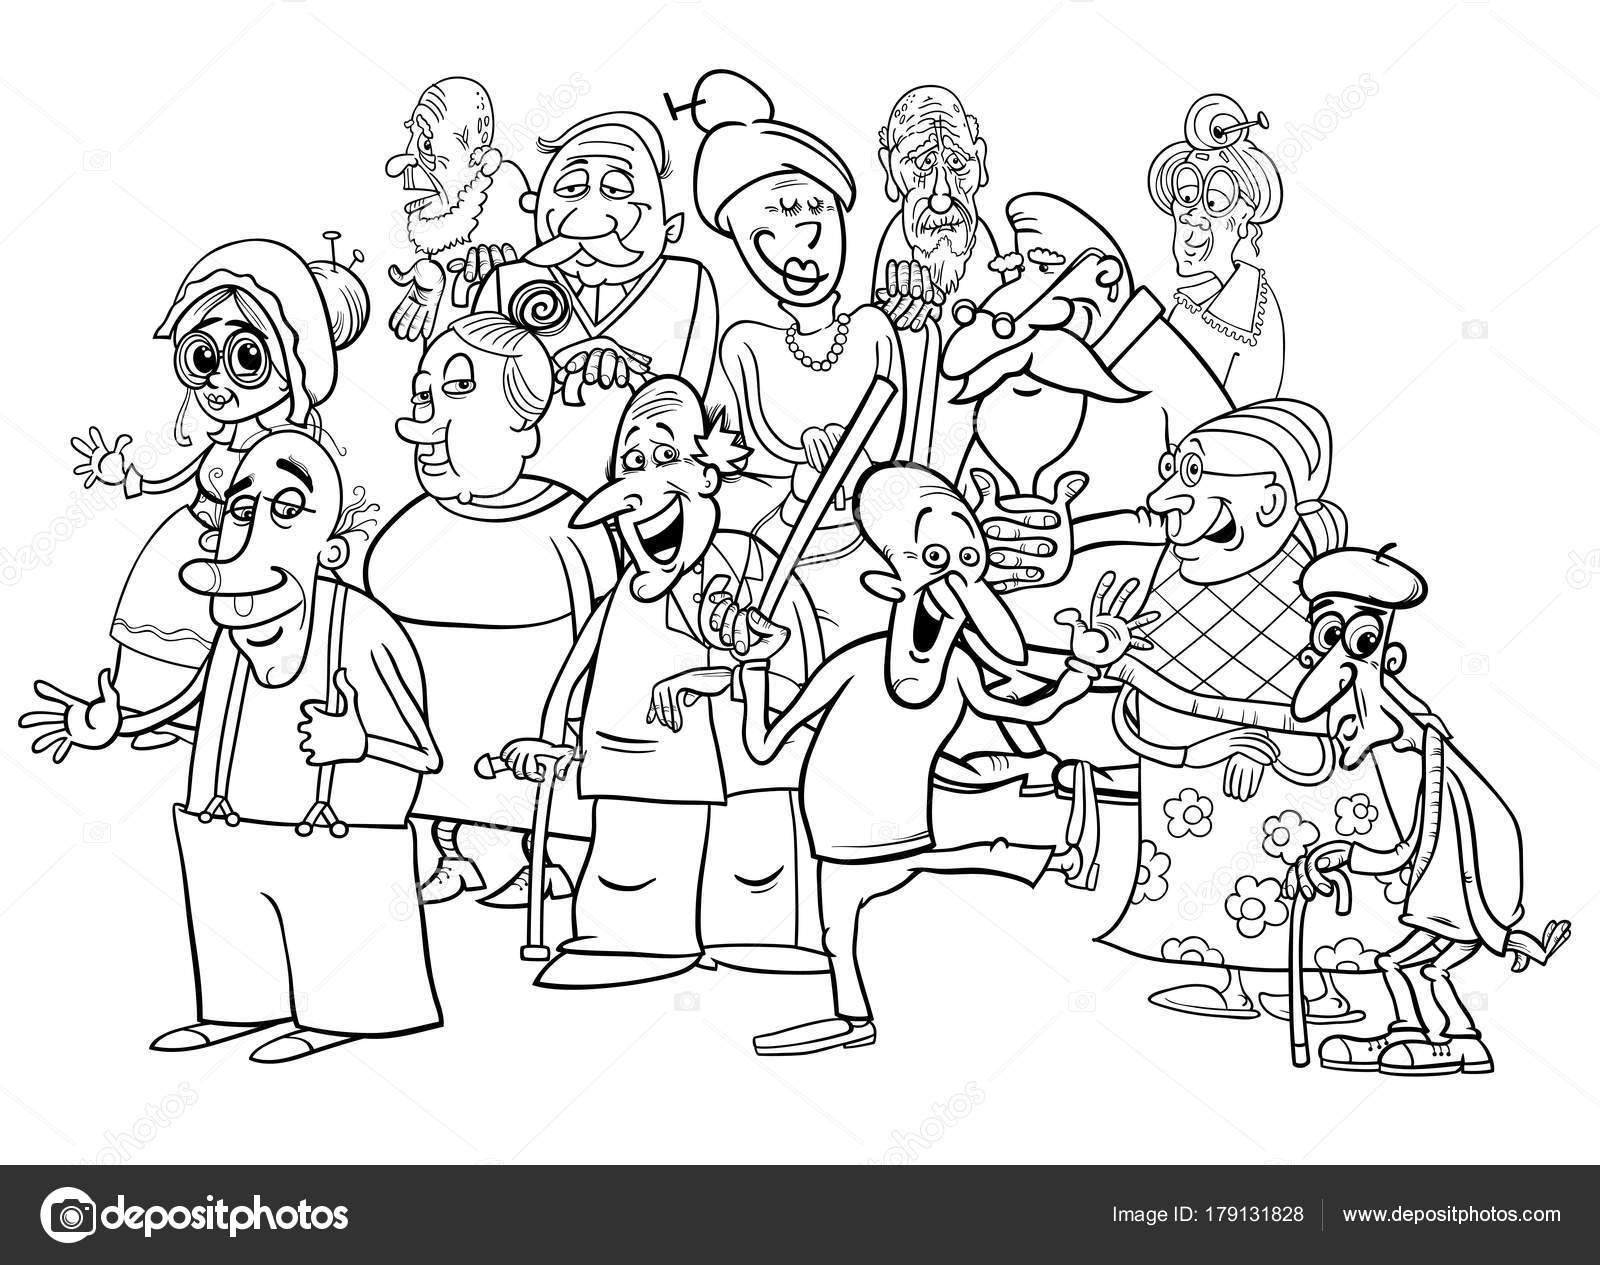 Grupo de altos personajes dibujos animados para colorear libro ...